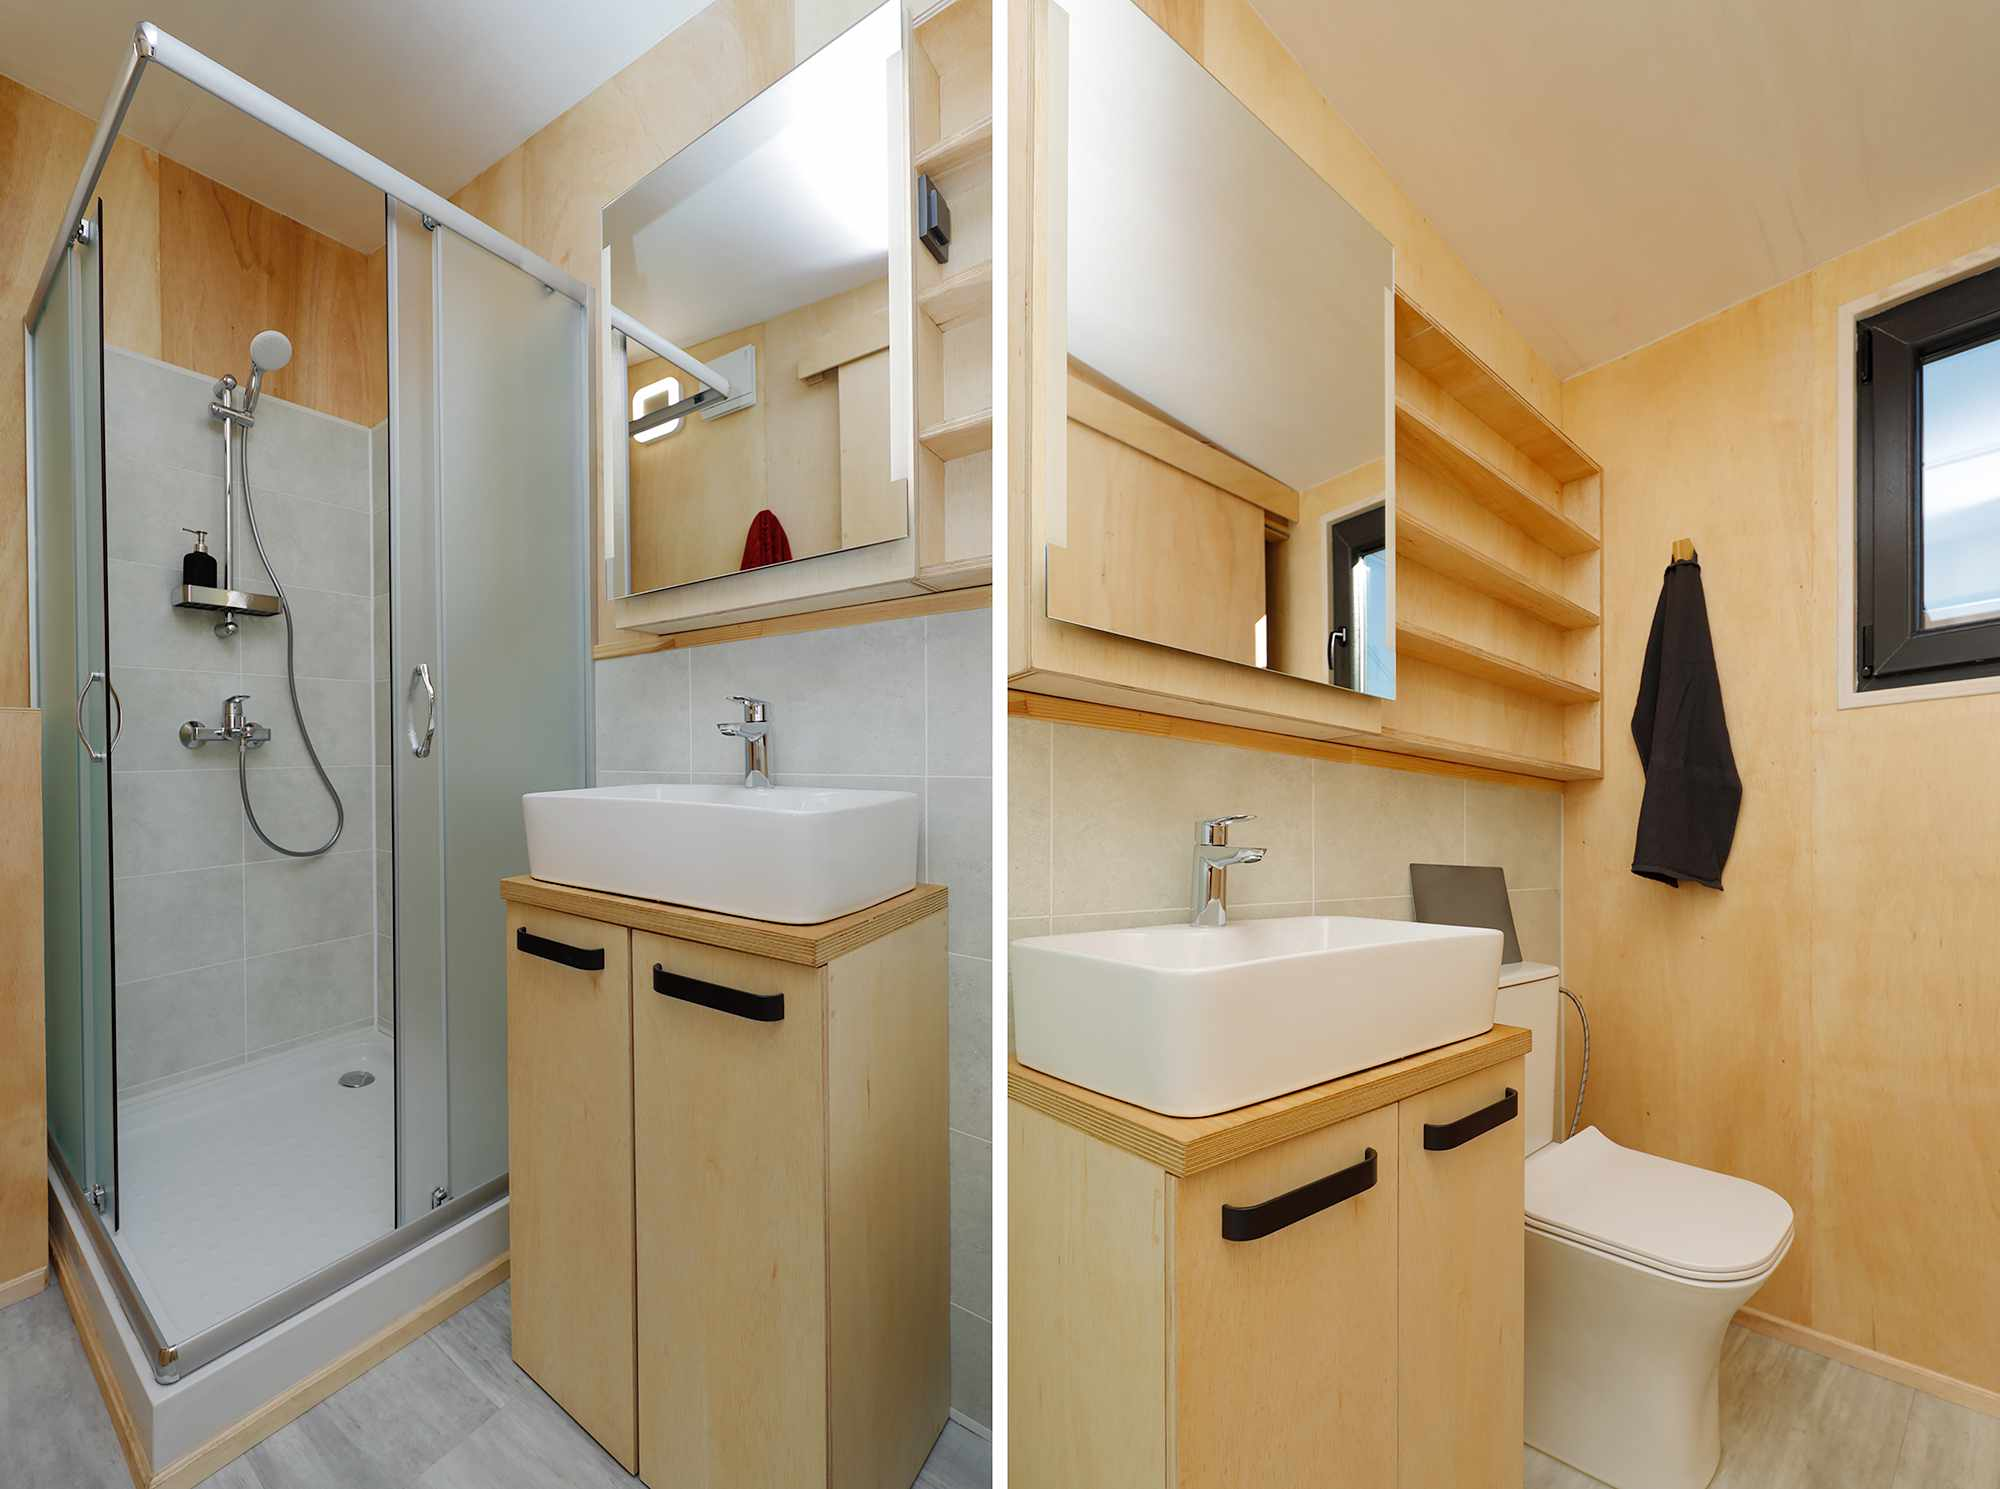 EBH 659 tiny house Ecobox Home Ltd. bathroom